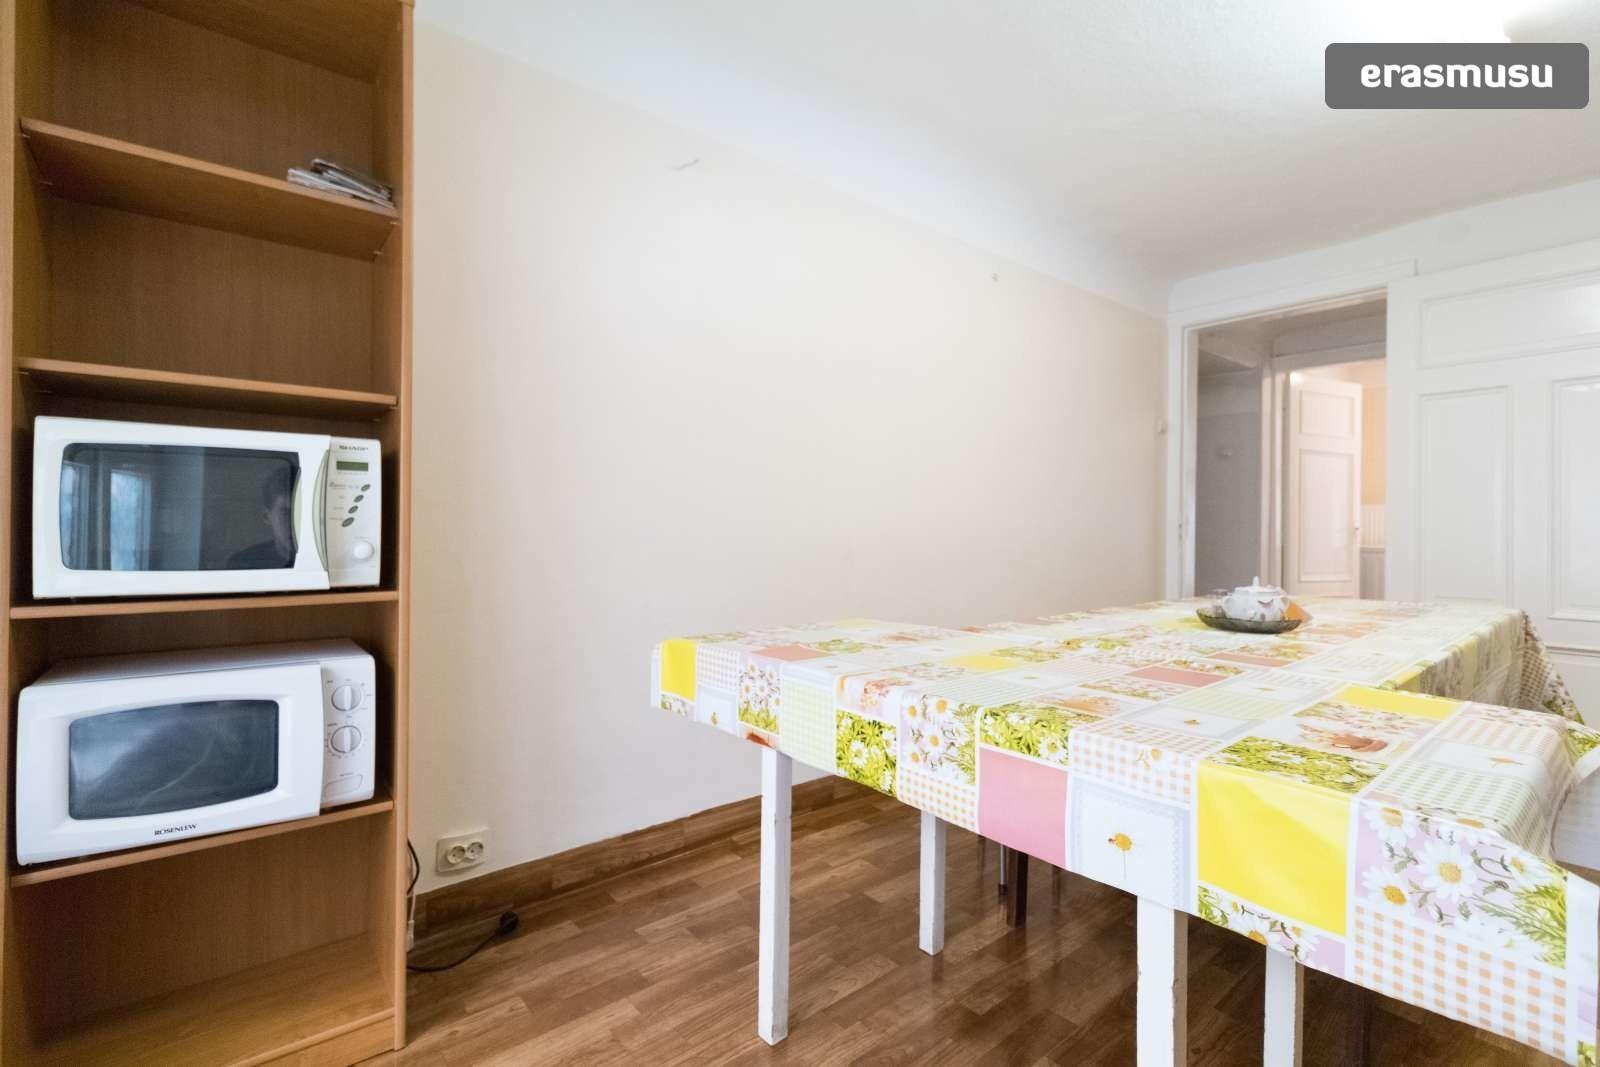 spacious-3-bedroom-apartment-rent-avoti-153cf86eb4b0472f5ffe3125